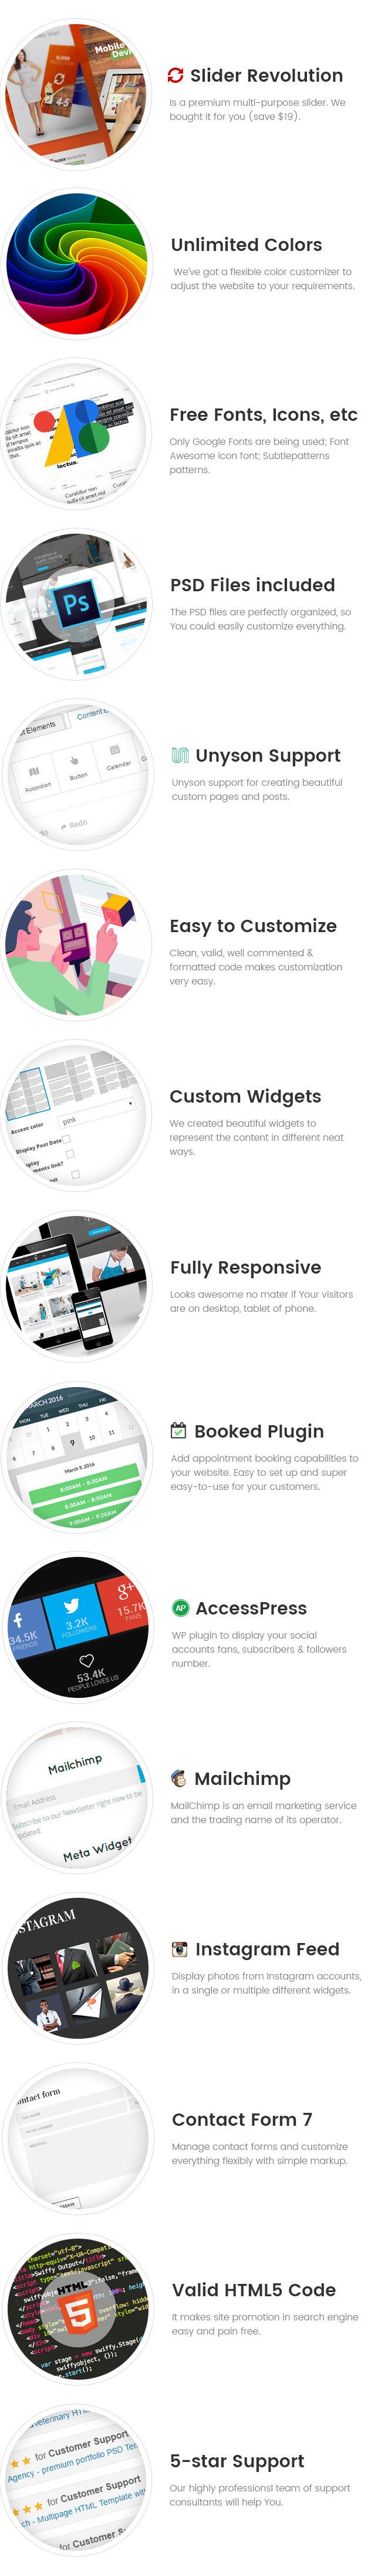 PrettyPress - House Cleaning Service WordPress Theme